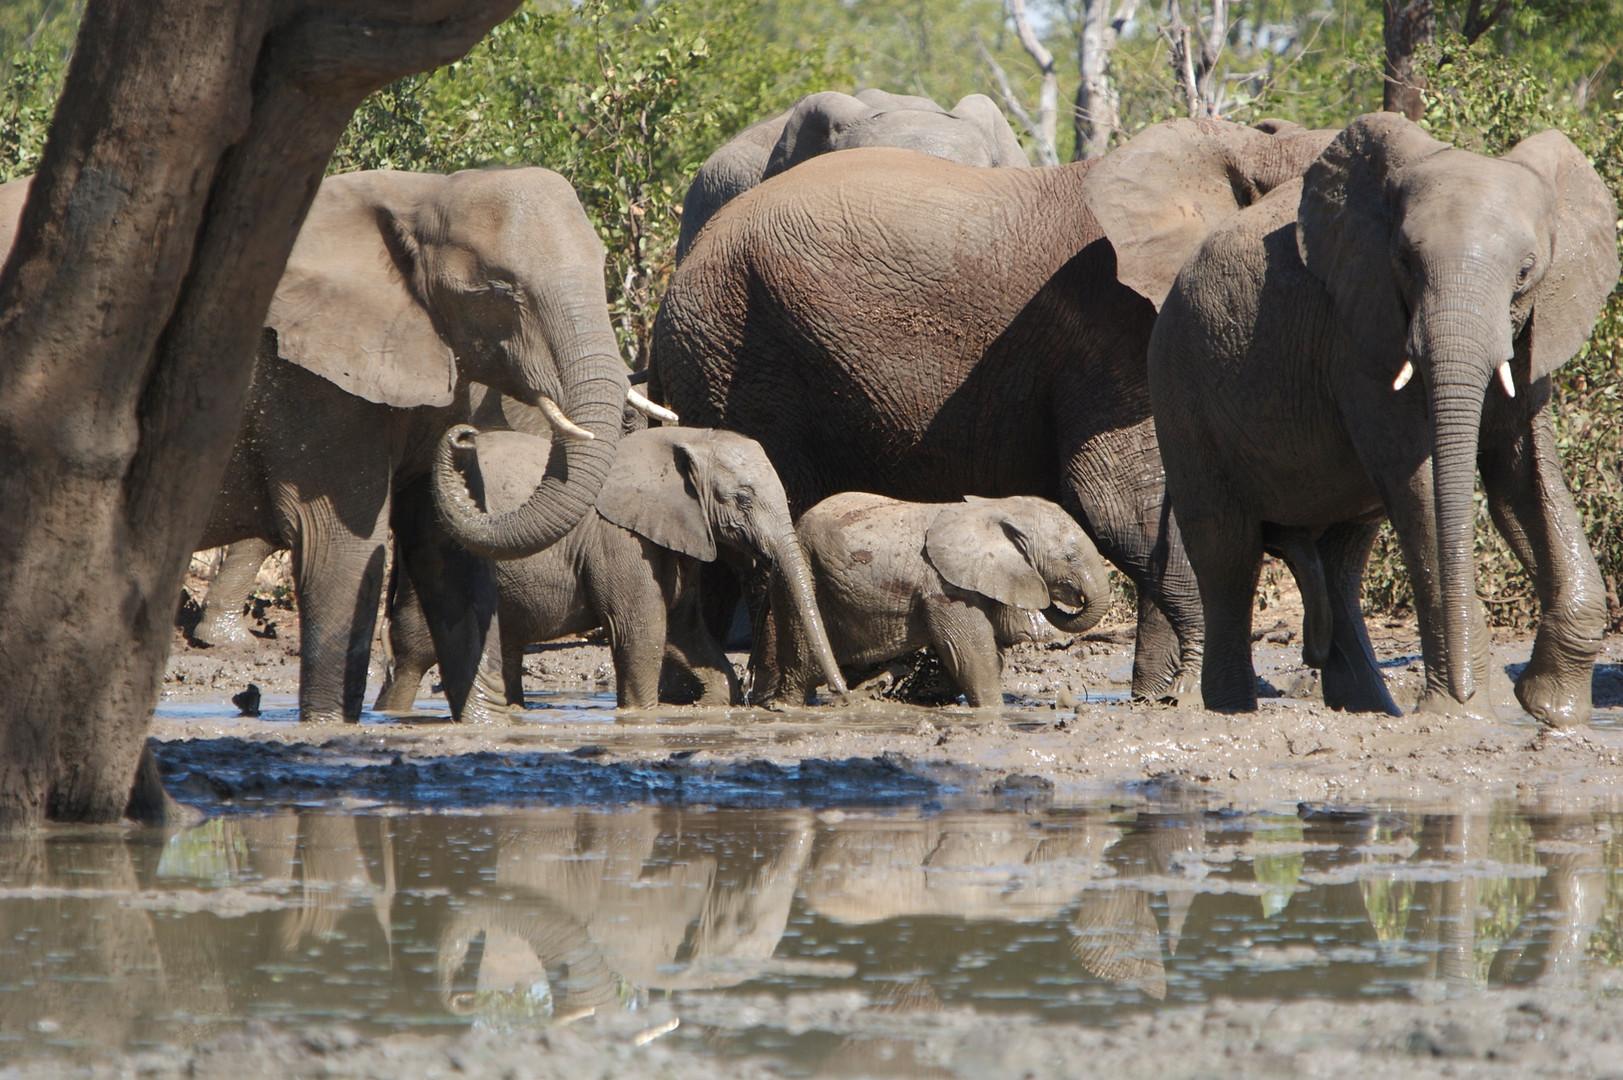 Elephants at Malilangwe, Zimbabwe